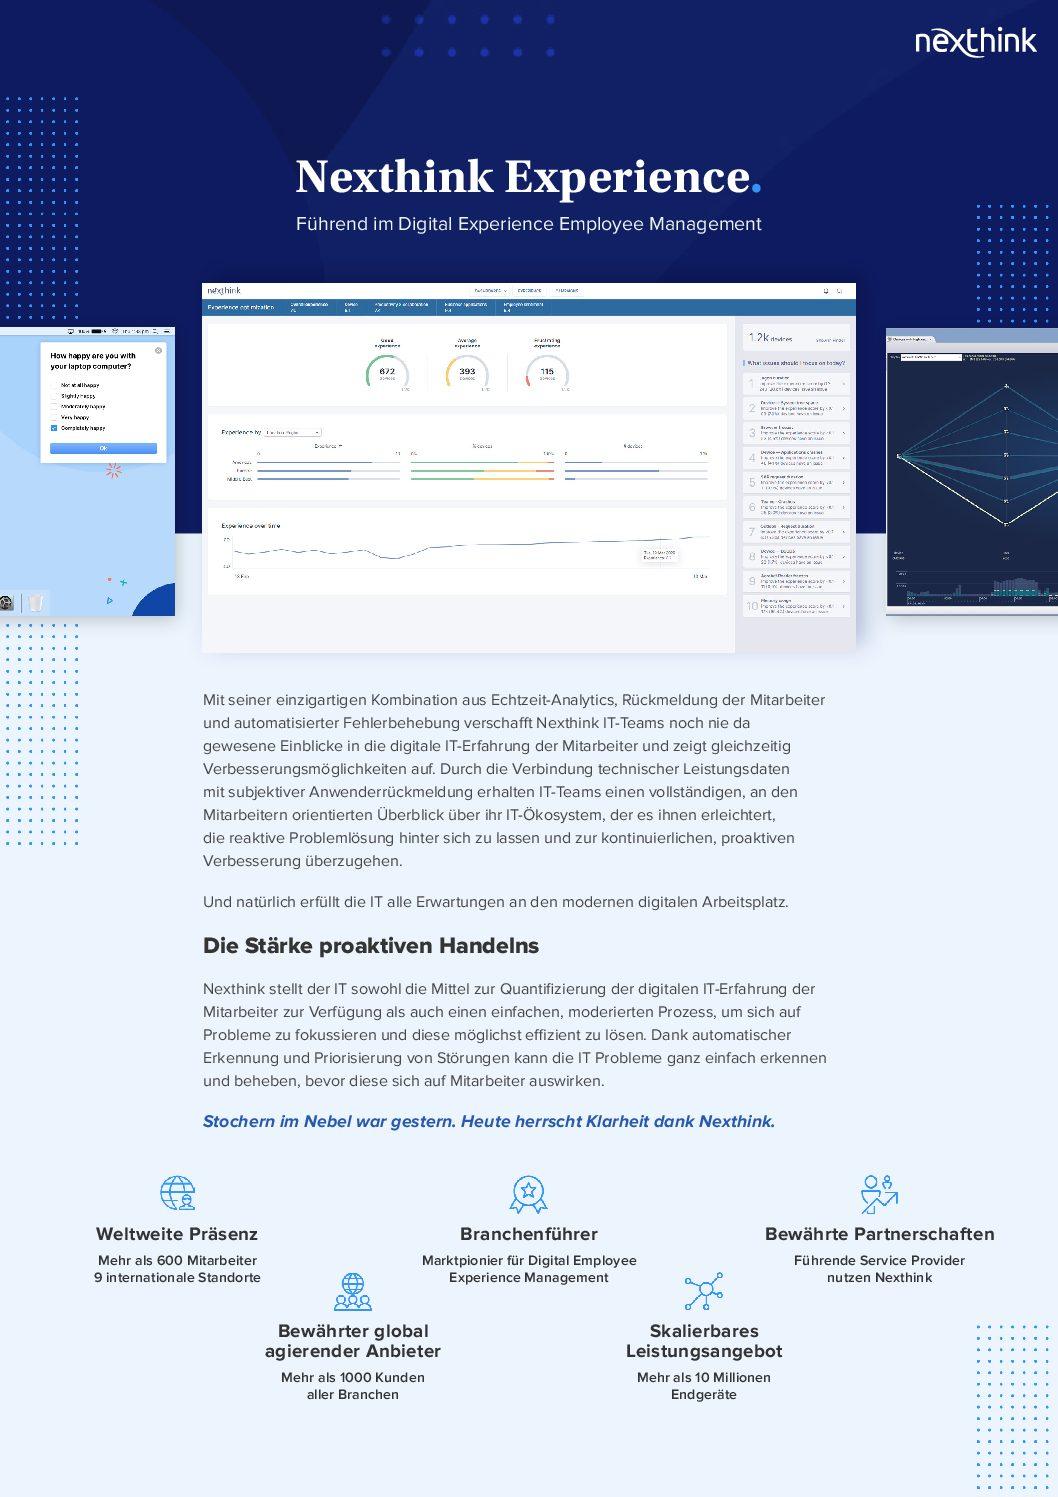 Nexthink Experience Plattform